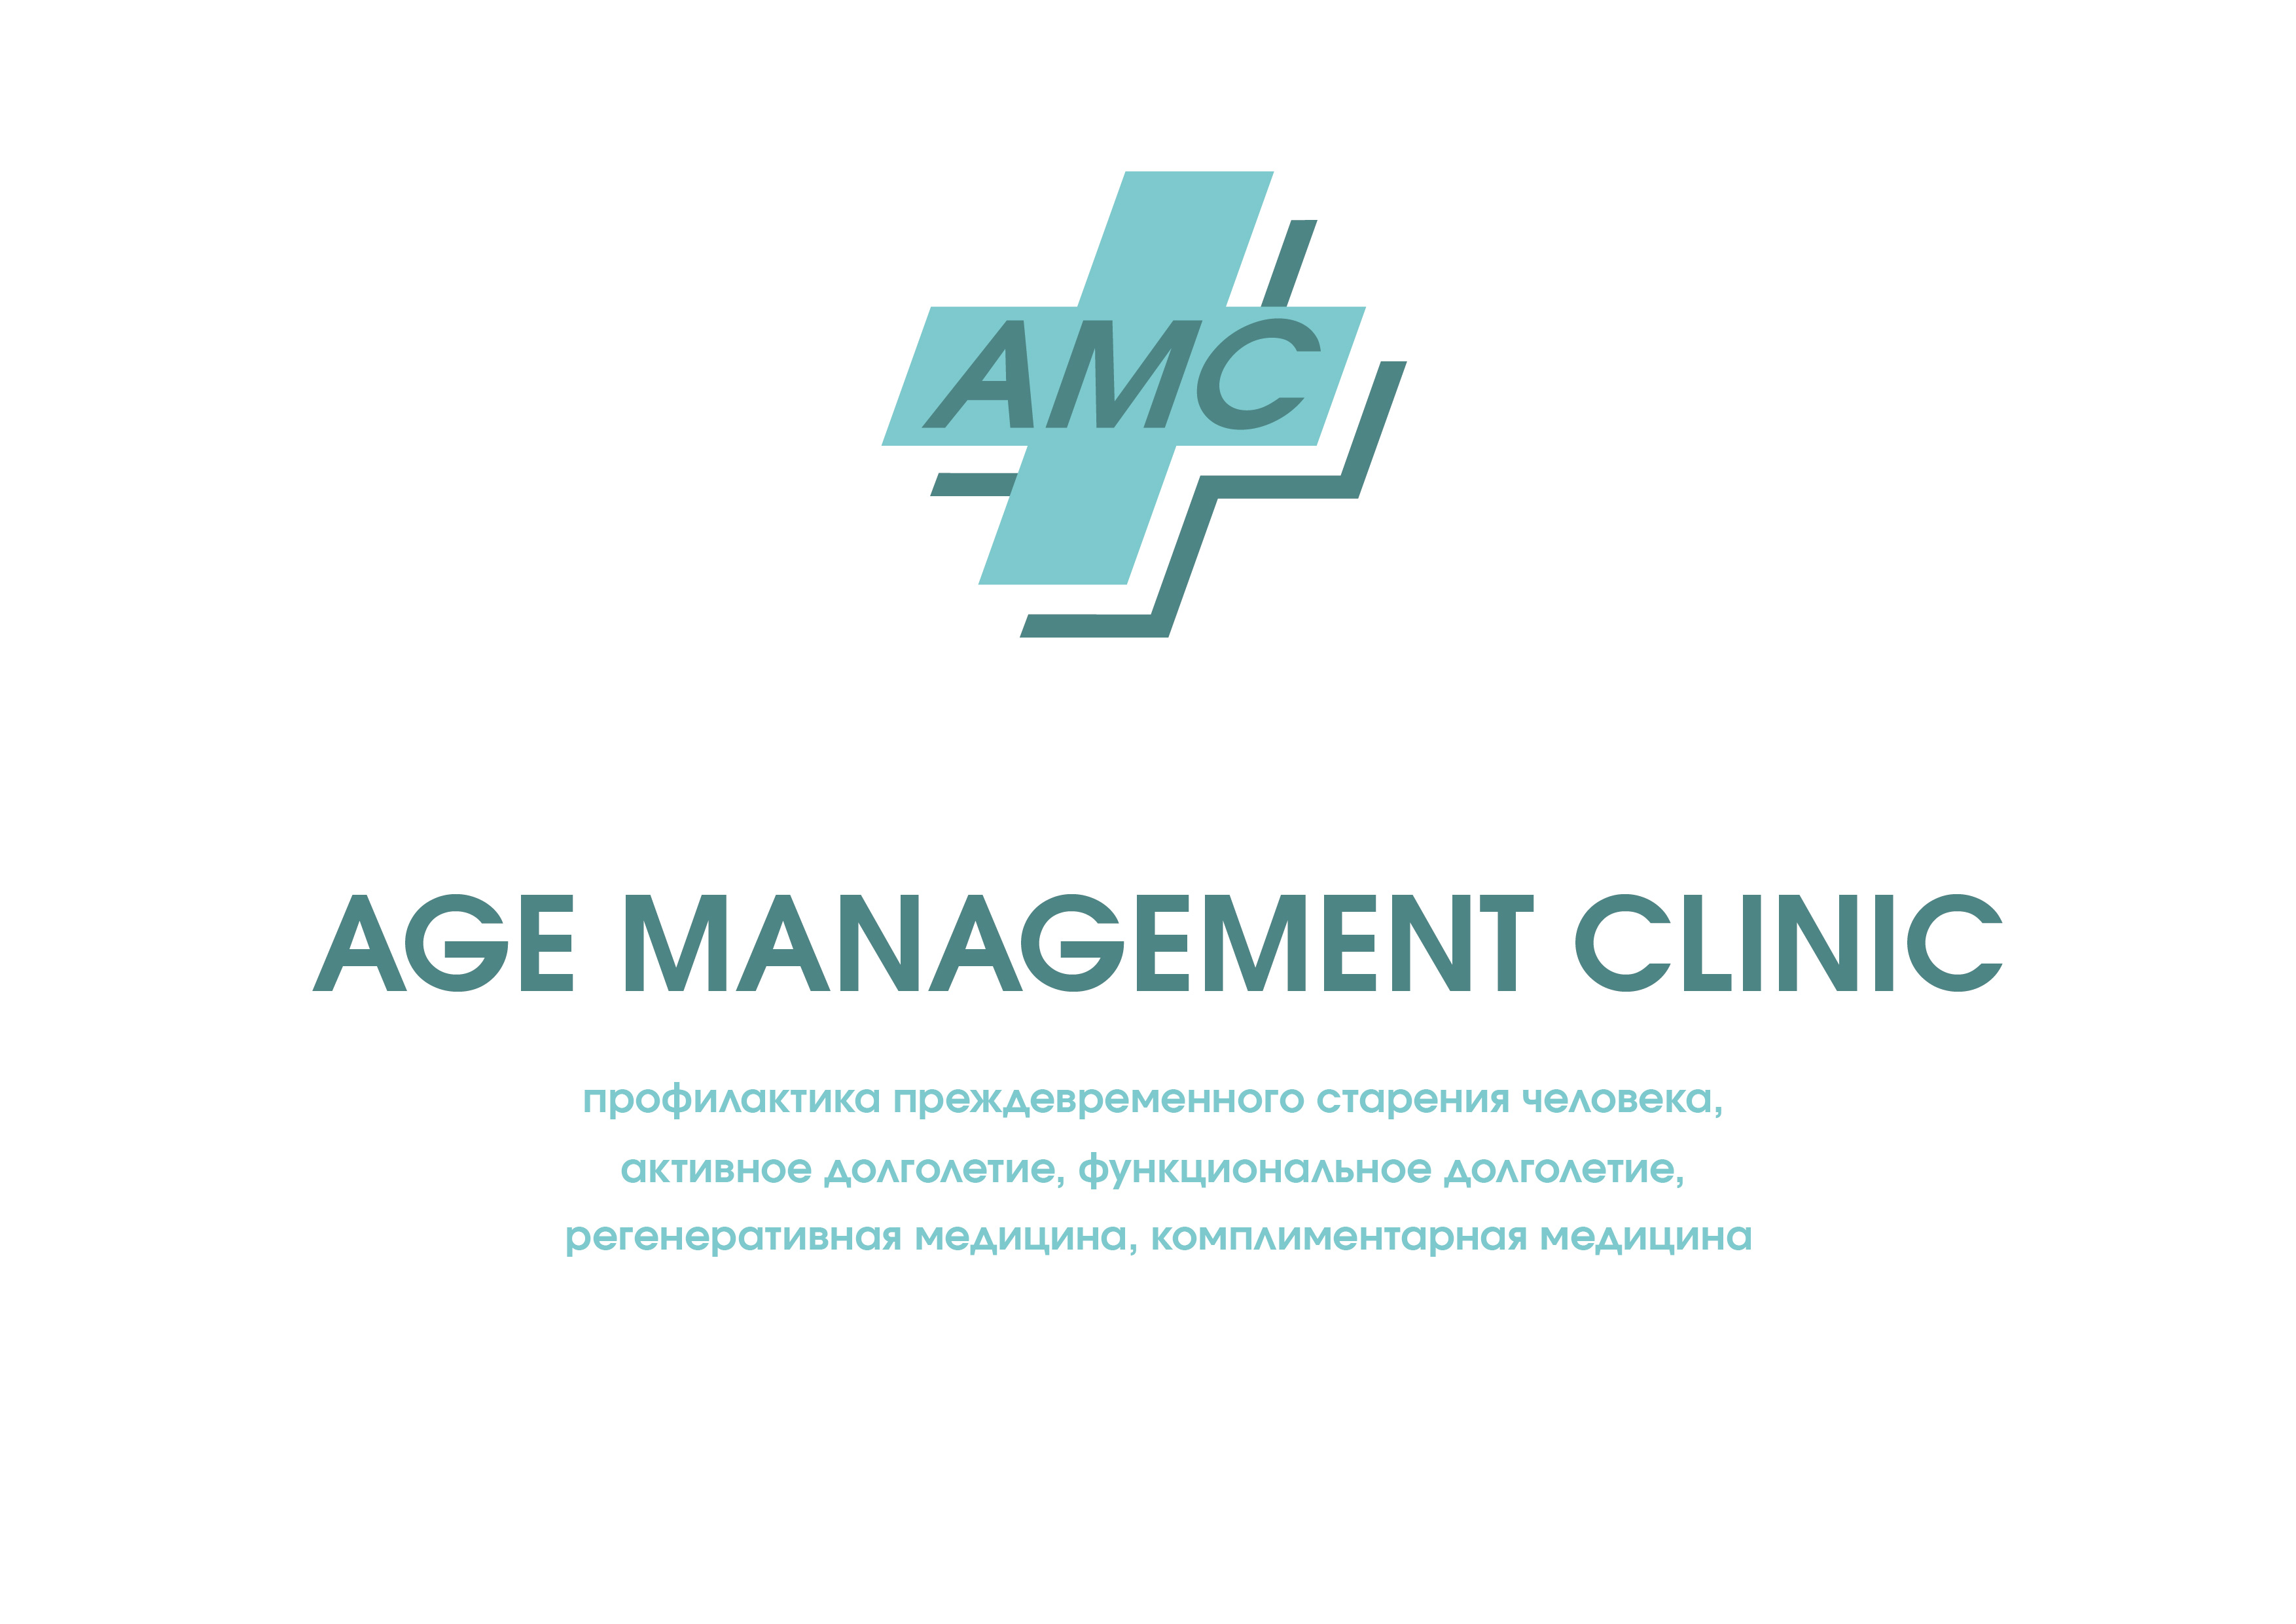 Логотип для медицинского центра (клиники)  фото f_5025b9cc5e24751e.jpg